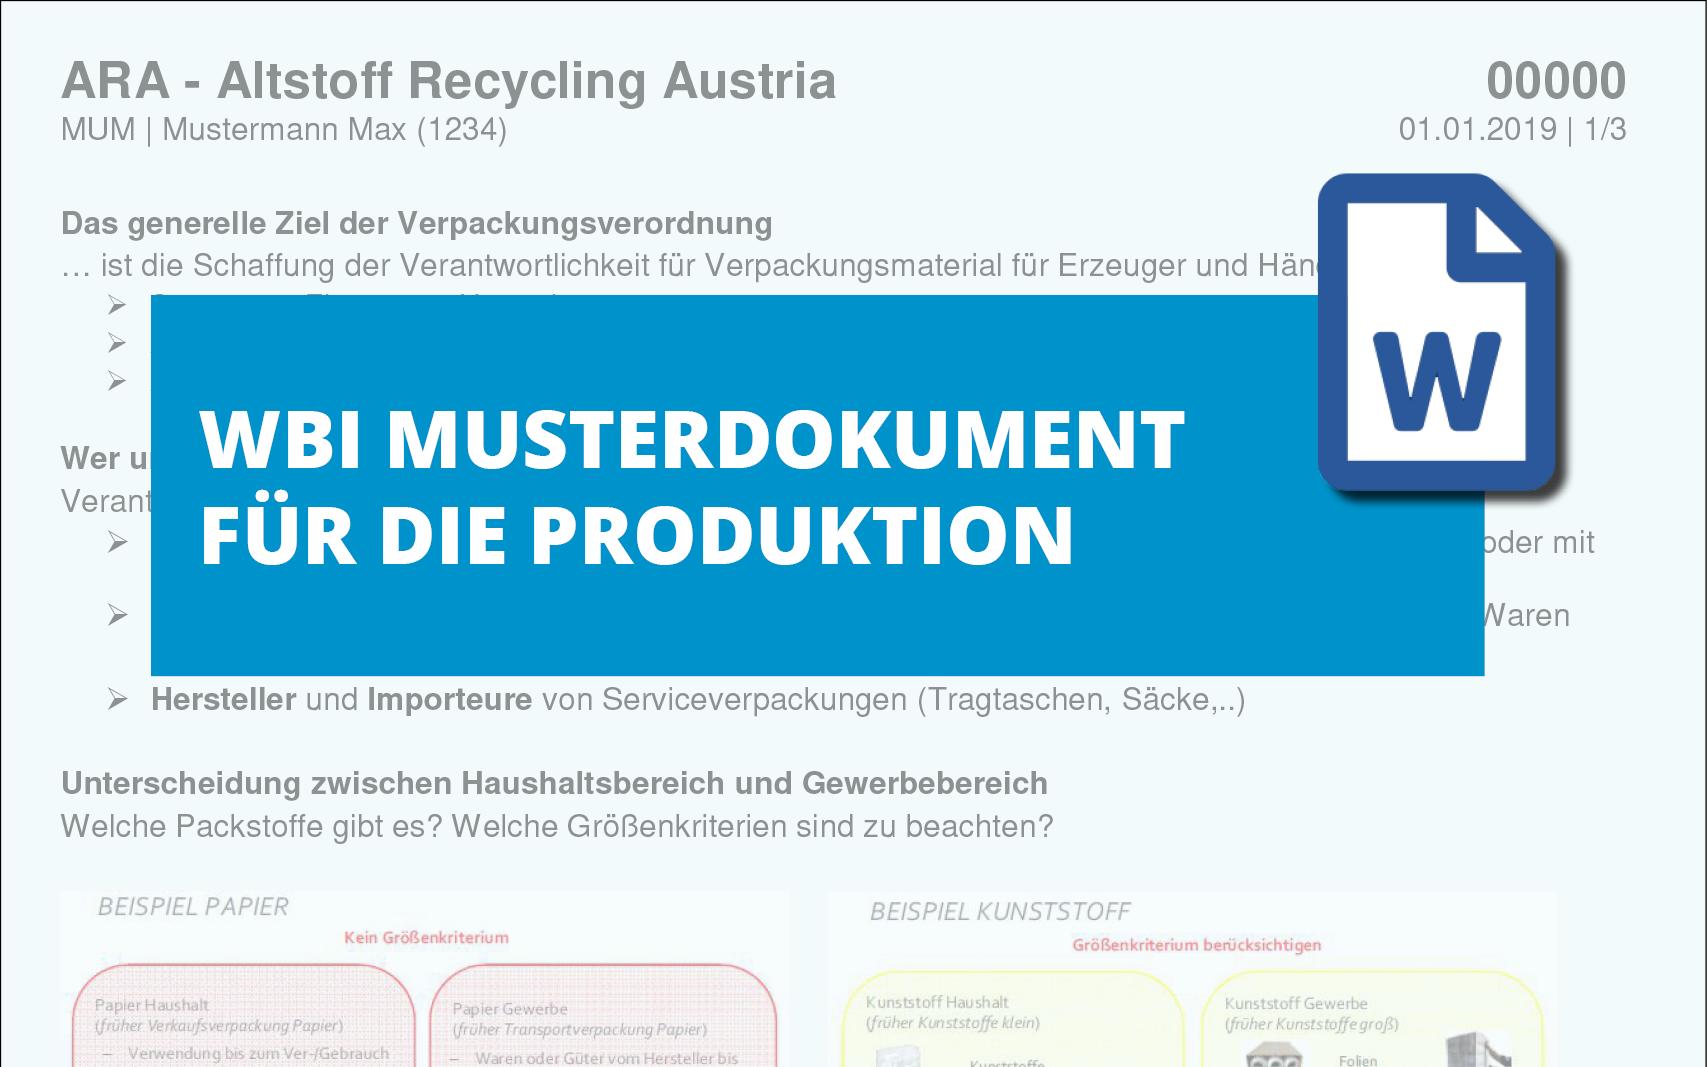 ara-altstoff-recycling-austria